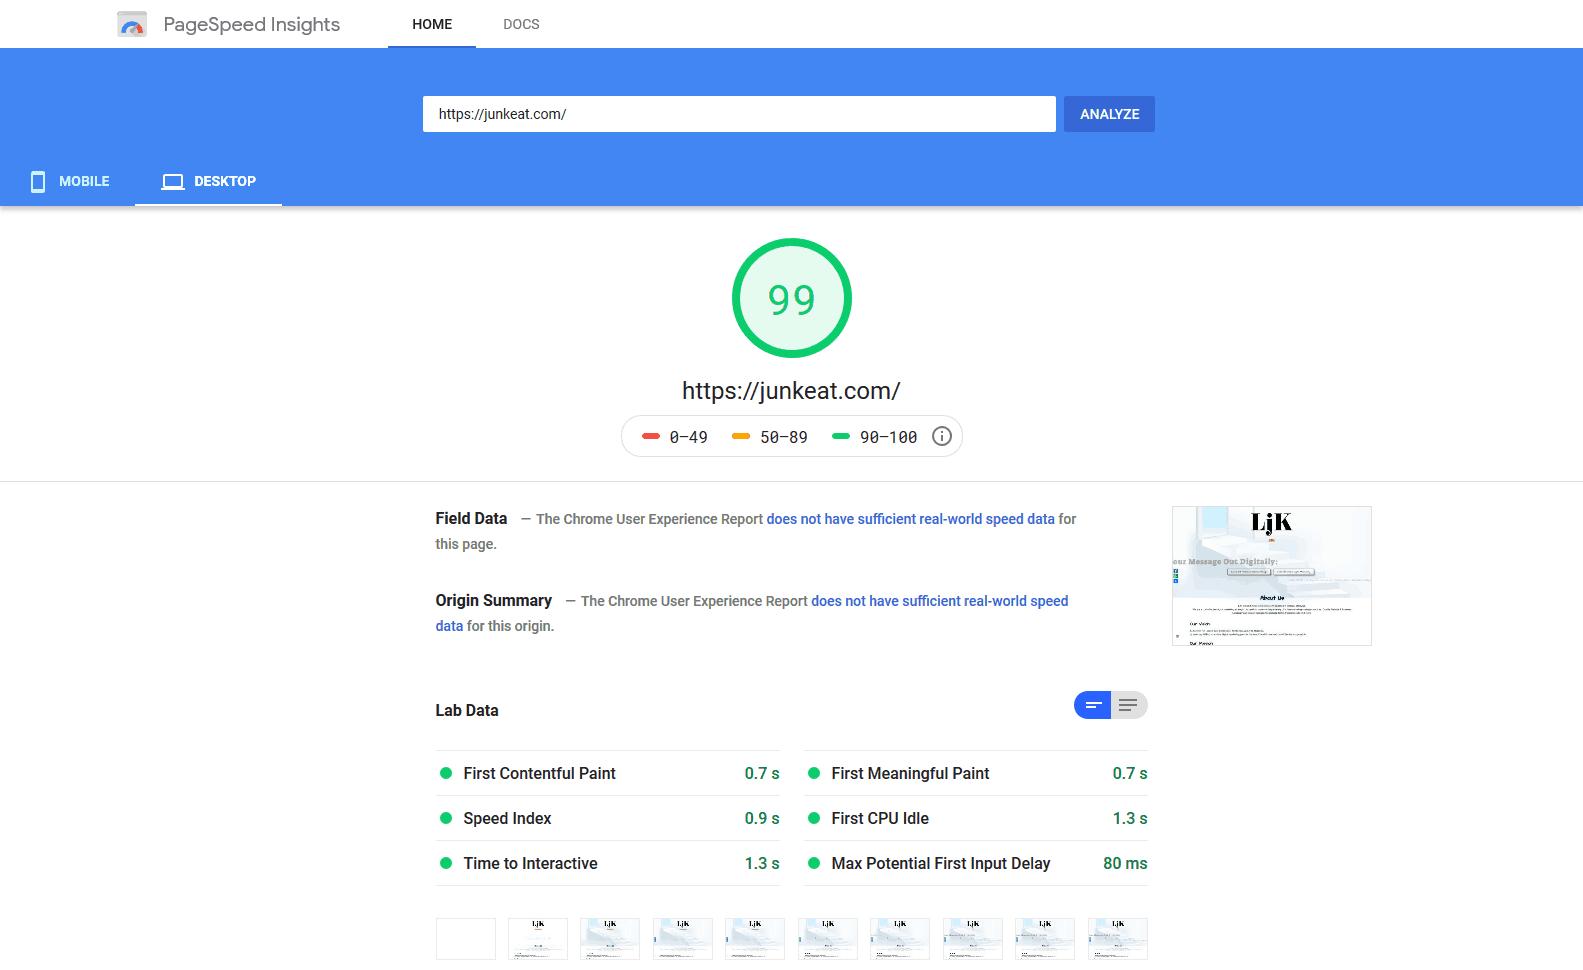 Low-Cost Premium Web Design Agency Cheras - Google Page Speed - LjK Digital Empire